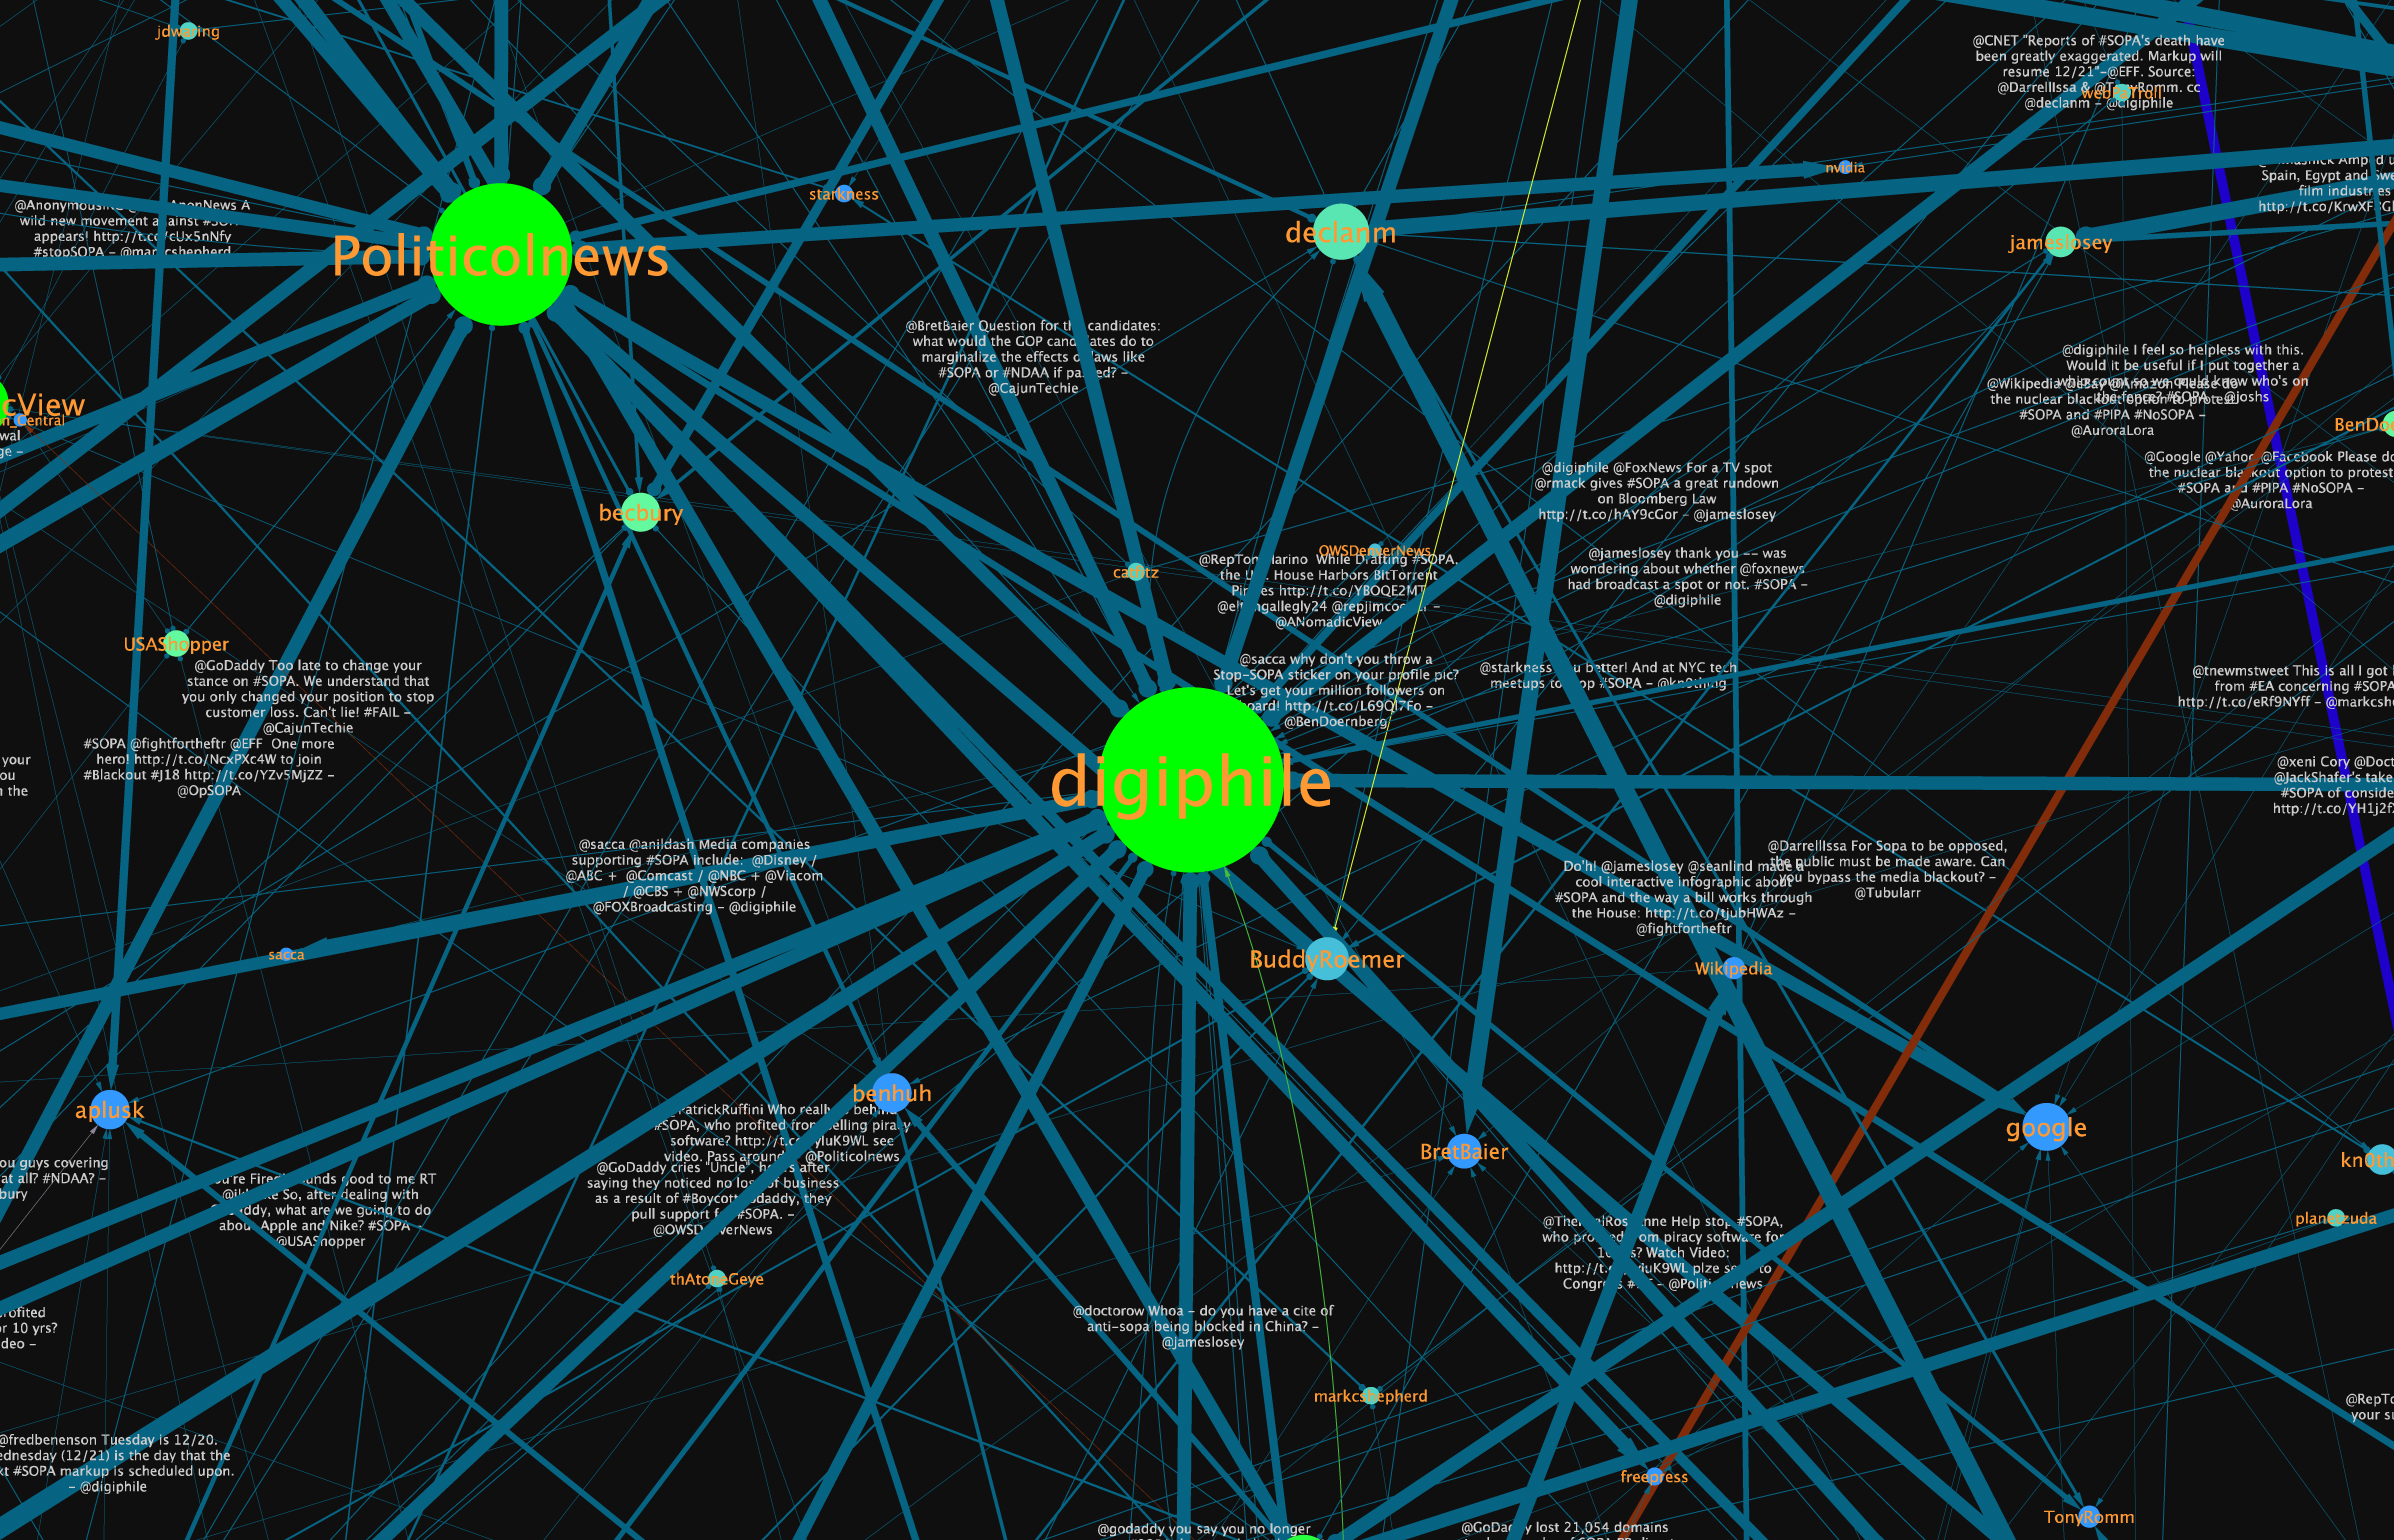 Visualizing SOPA on Twitter | Fred Benenson